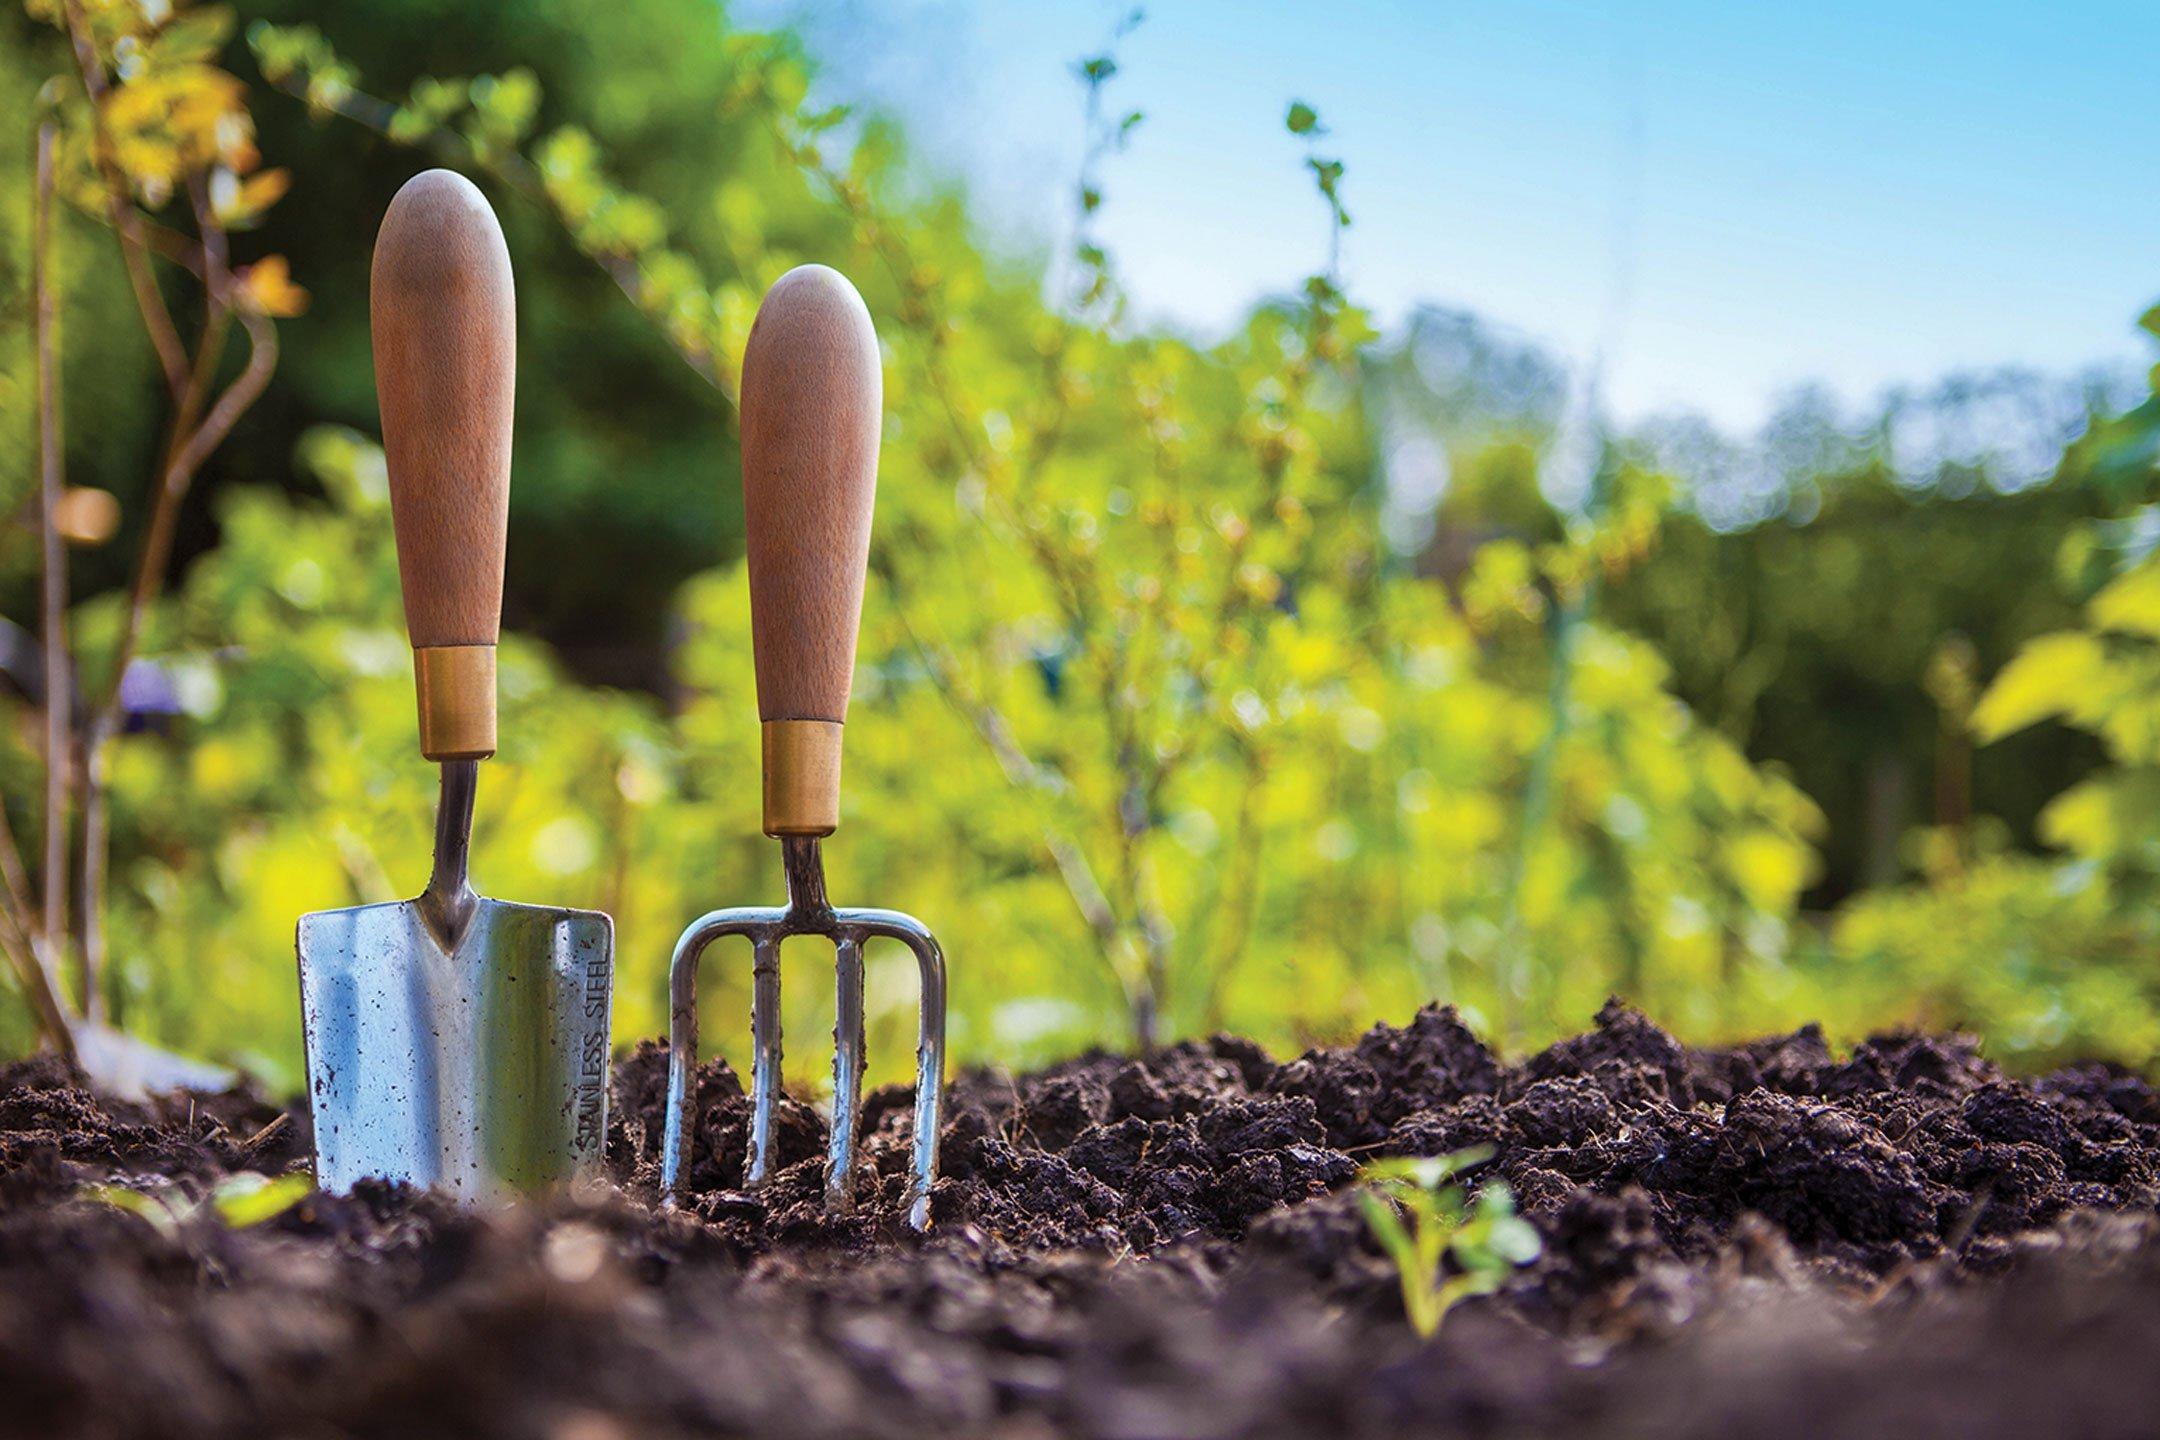 Gardening Tips for May - The Sun-Gazette Newspaper